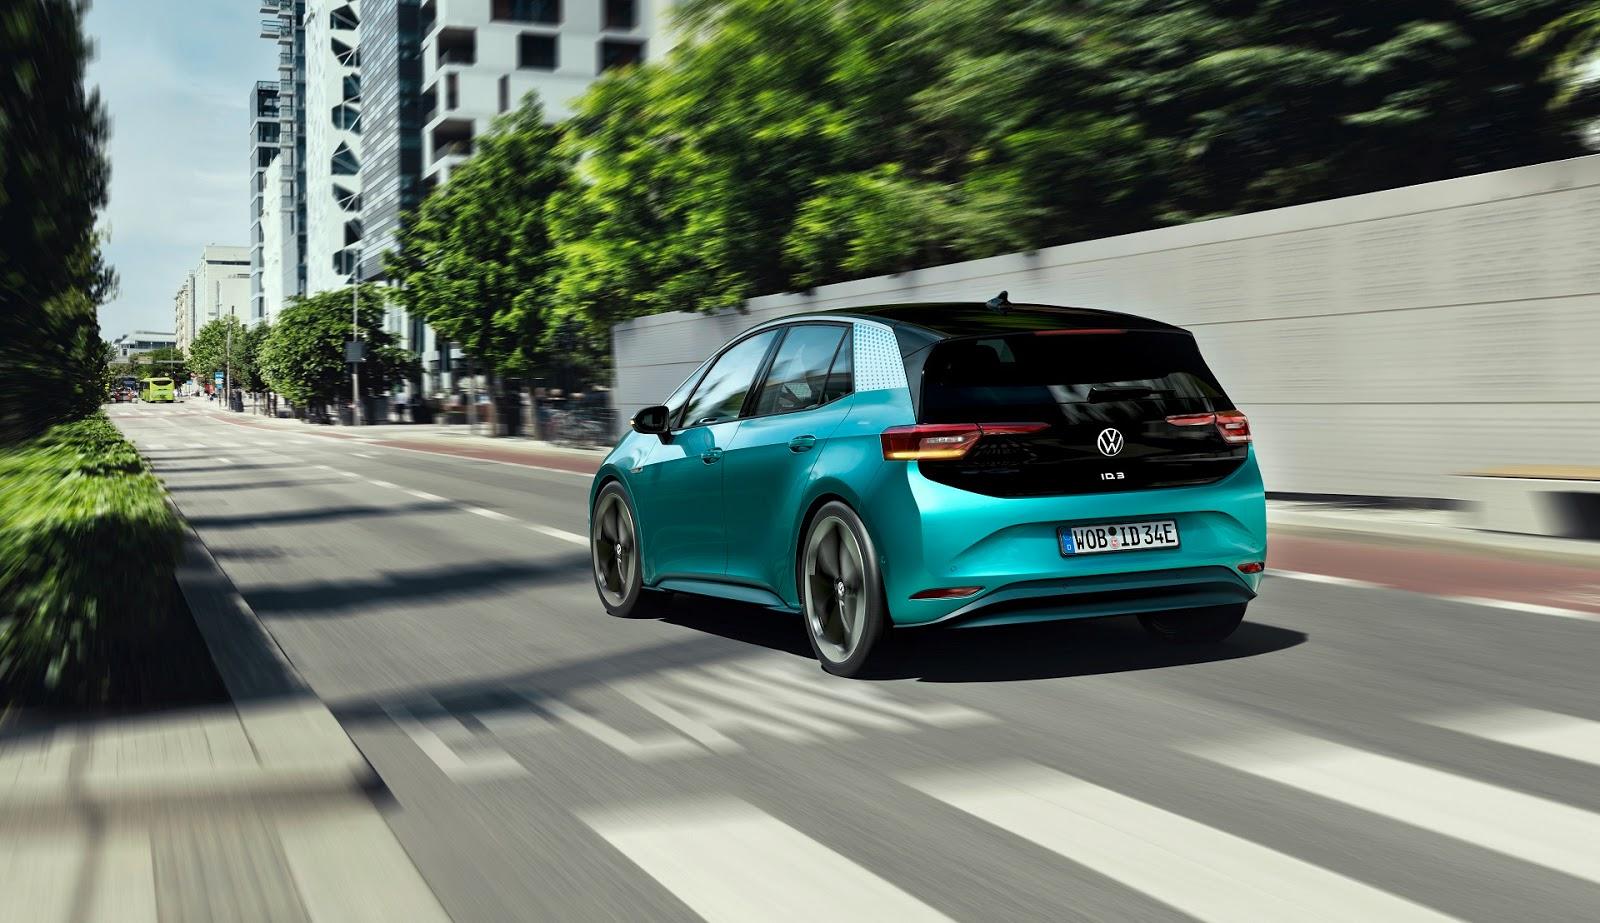 VOLKSWAGEN2BID.3 6 Γιατί το φθηνό ηλεκτρικό της Volkswagen αλλάζει την αυτοκίνηση Volkswagen, zblog, καινούργιο, καινούρια, καινούριο, Τεχνολογία, τιμες, ΦΩΤΟ, φωτογραφίες